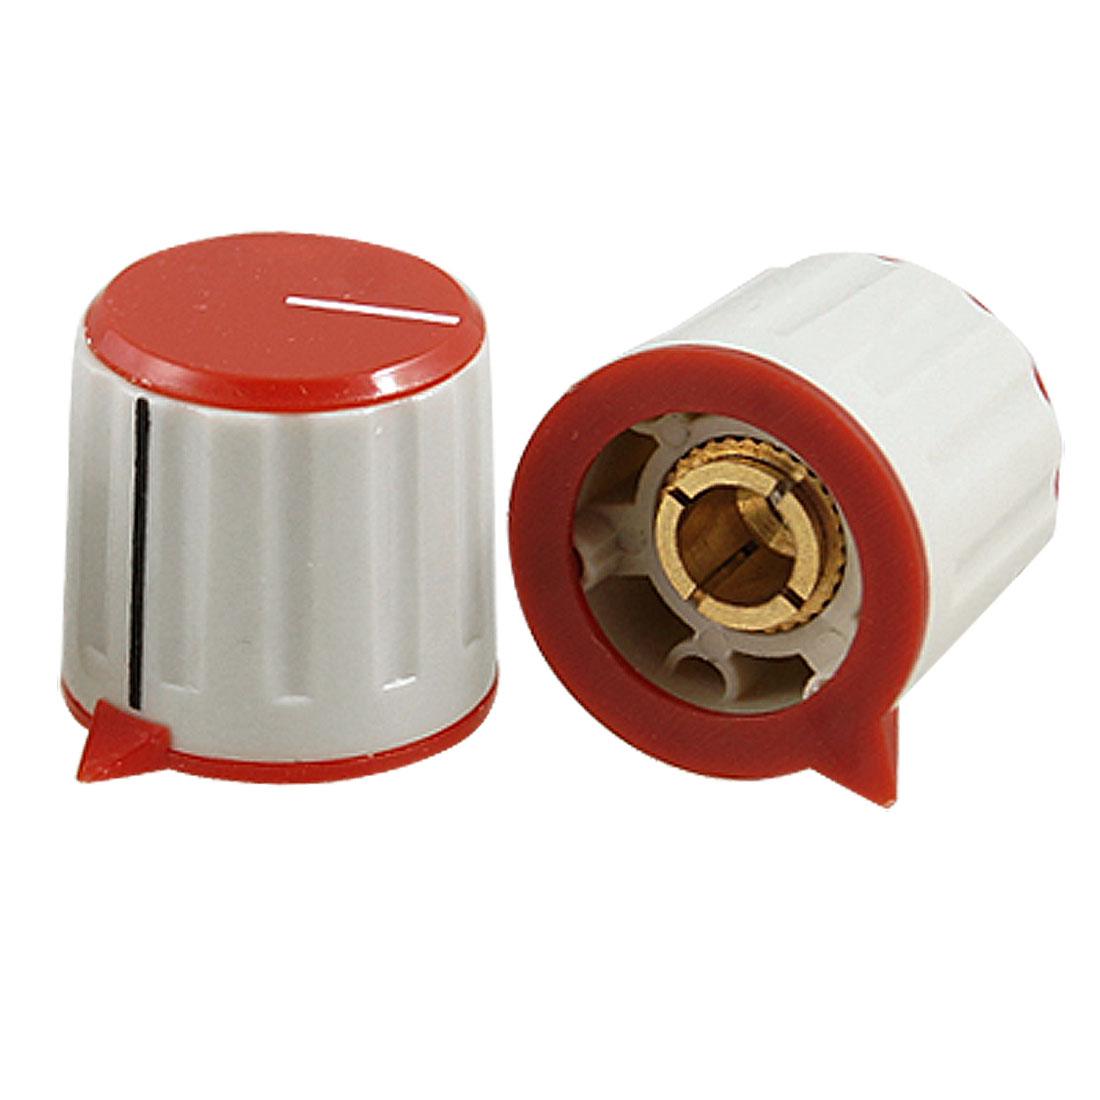 4 Pcs Red Gray Plastic Split Shaft Potentiometer Control Knobs